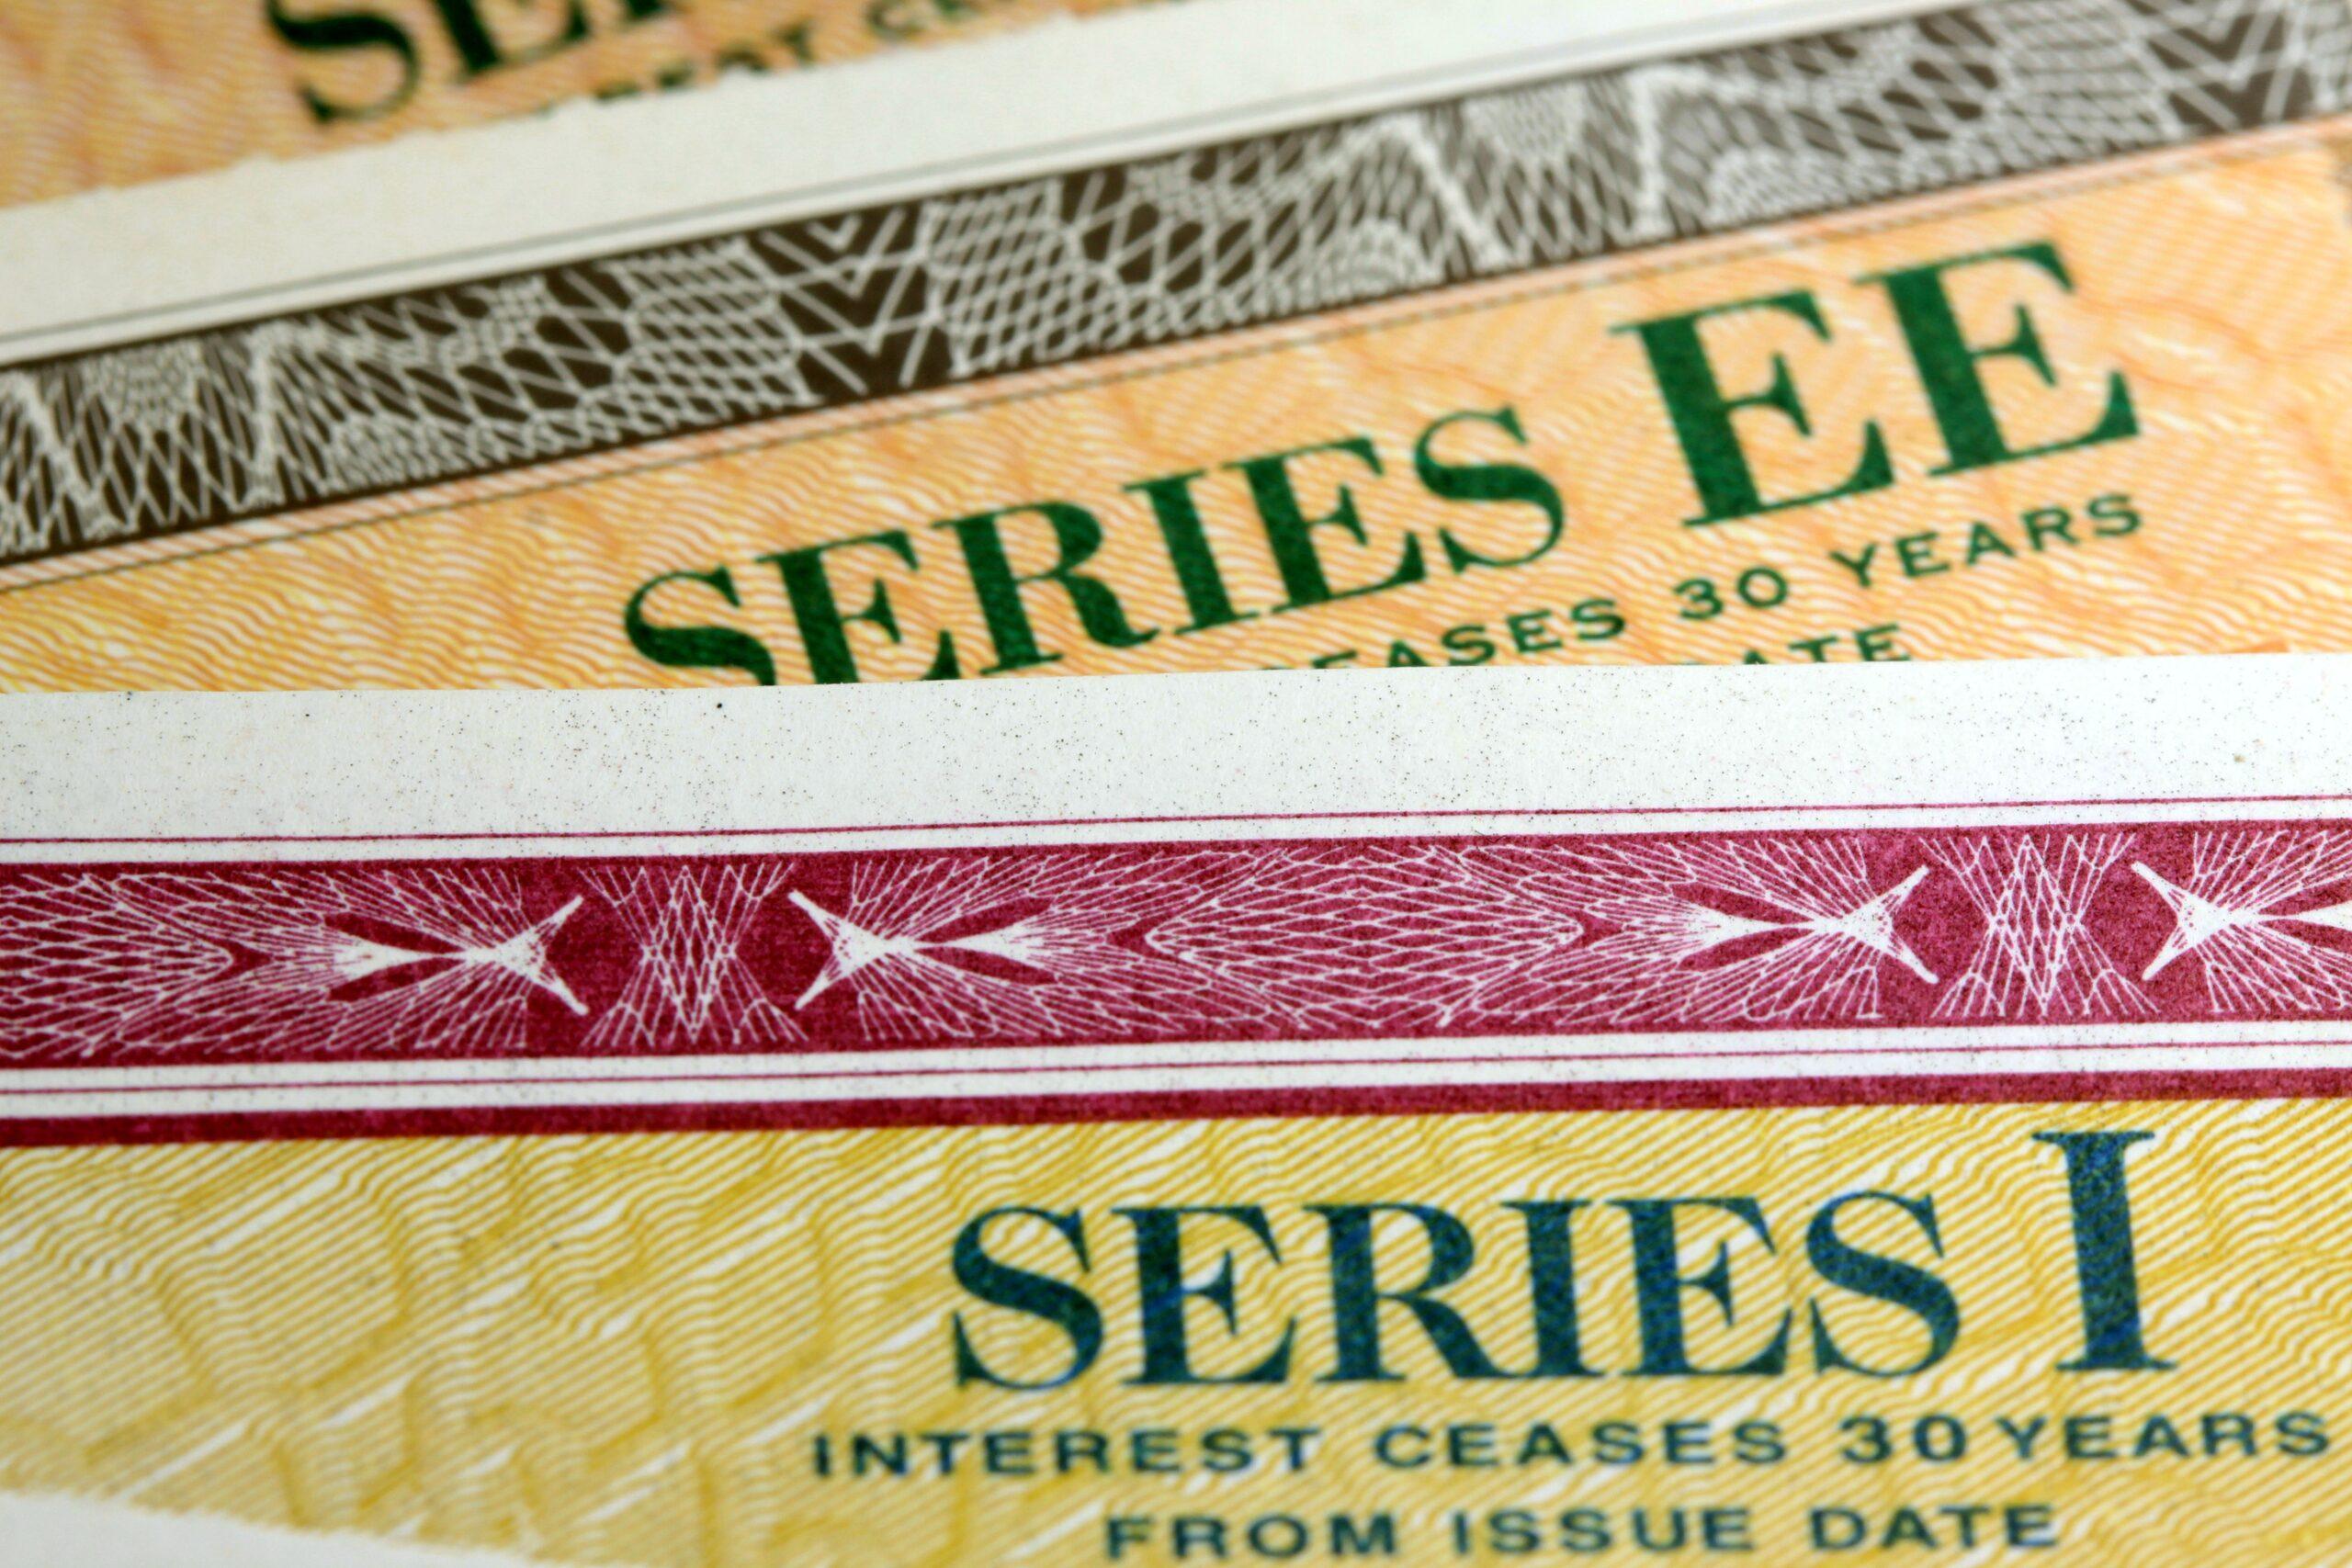 Cash in savings bonds